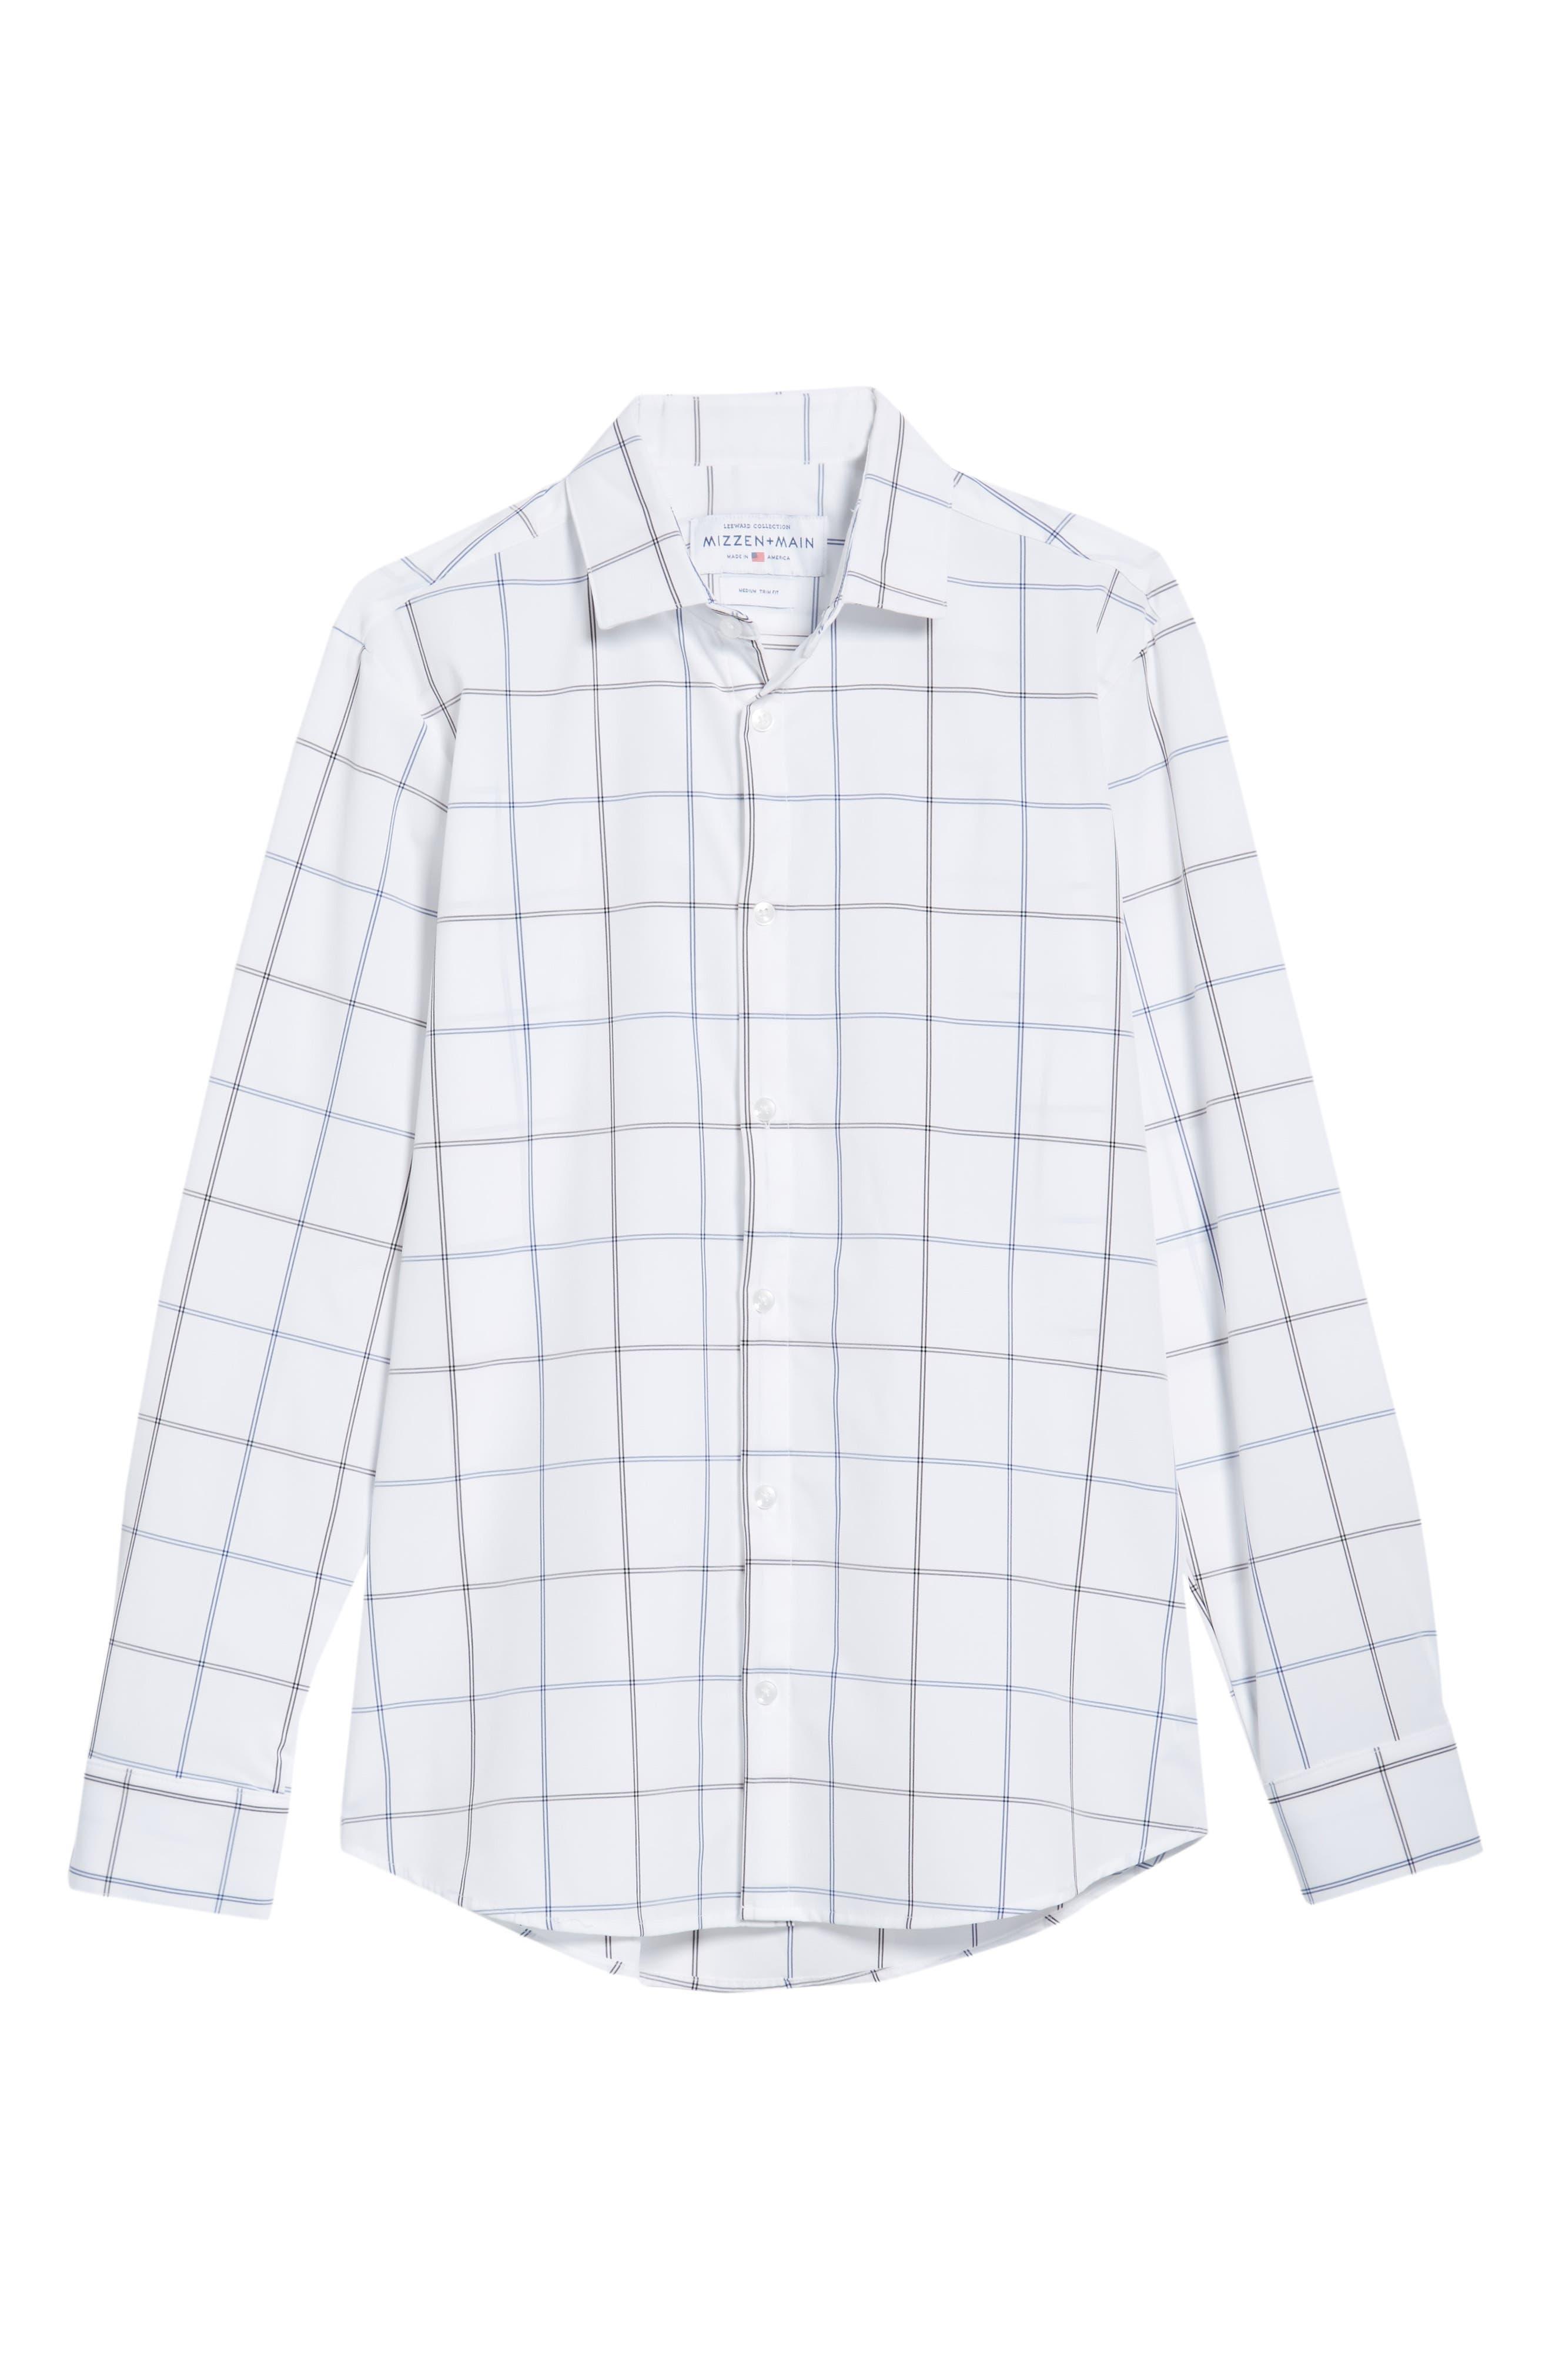 Crossman Slim Fit Grid Performance Sport Shirt,                             Alternate thumbnail 6, color,                             White